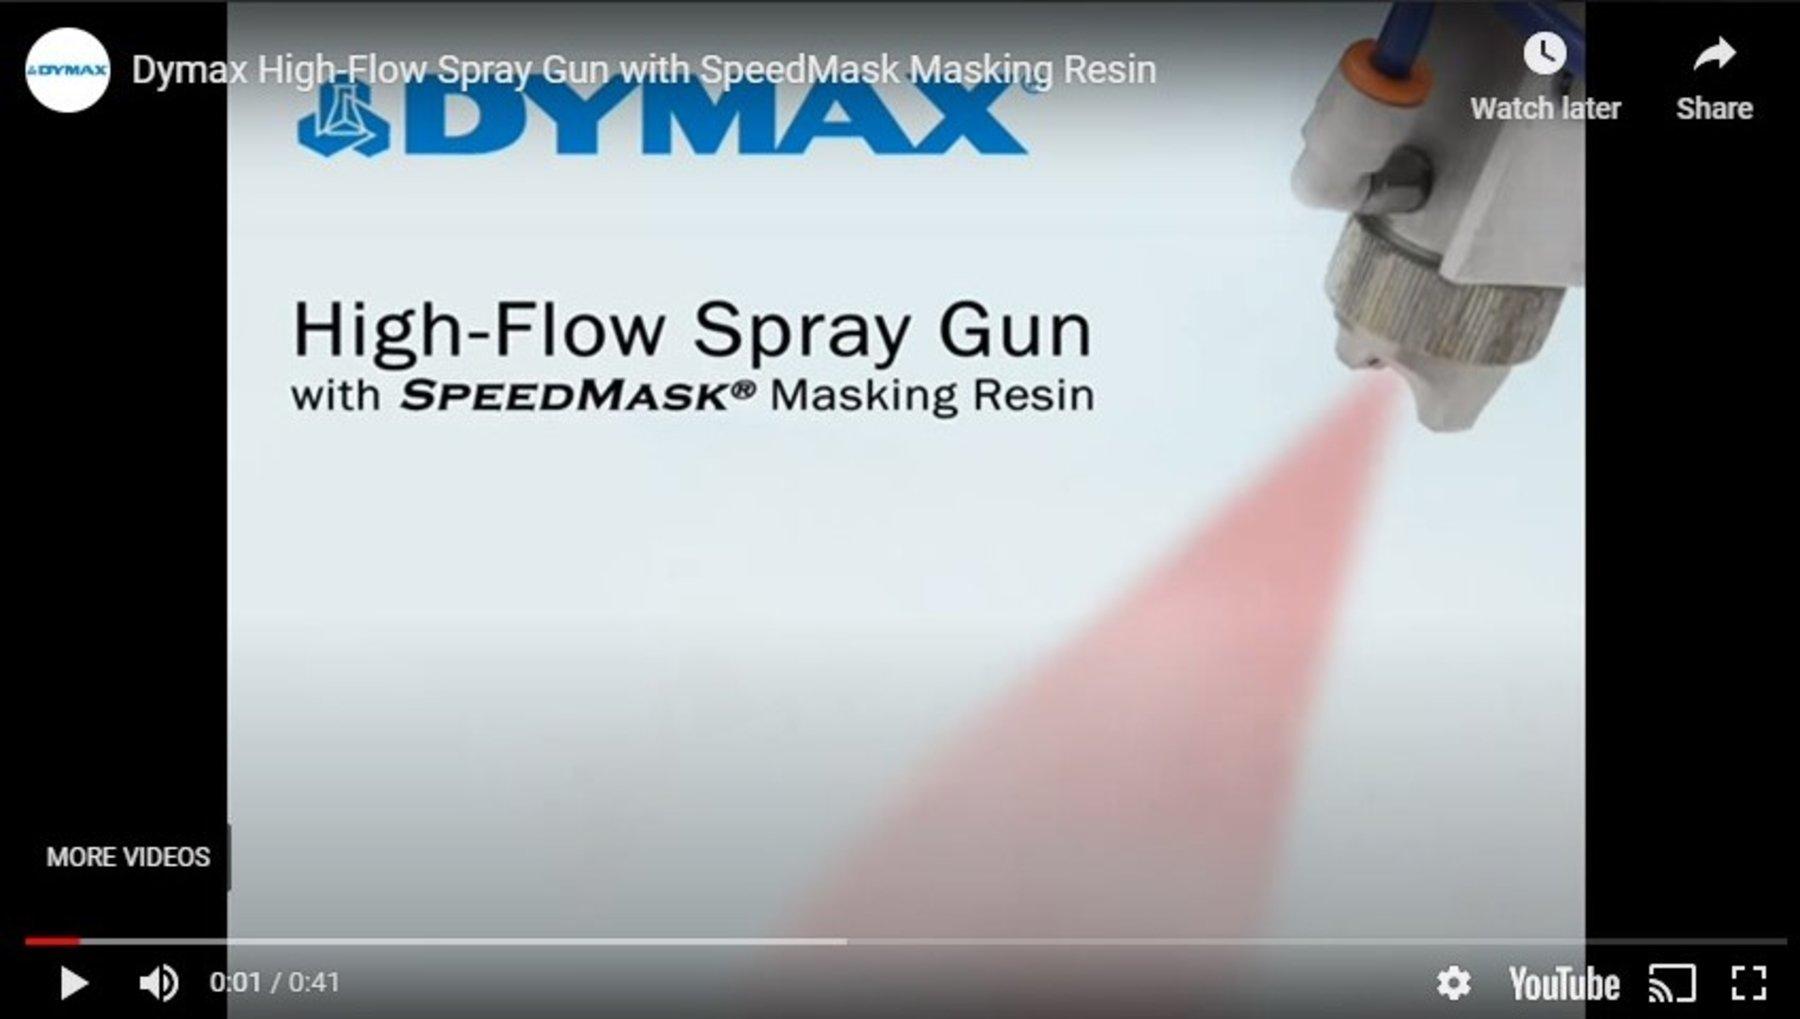 SpeedMask 마스킹 레진과 함께 제공되는 다이맥스 고유압 핸드헬드 스프레이어